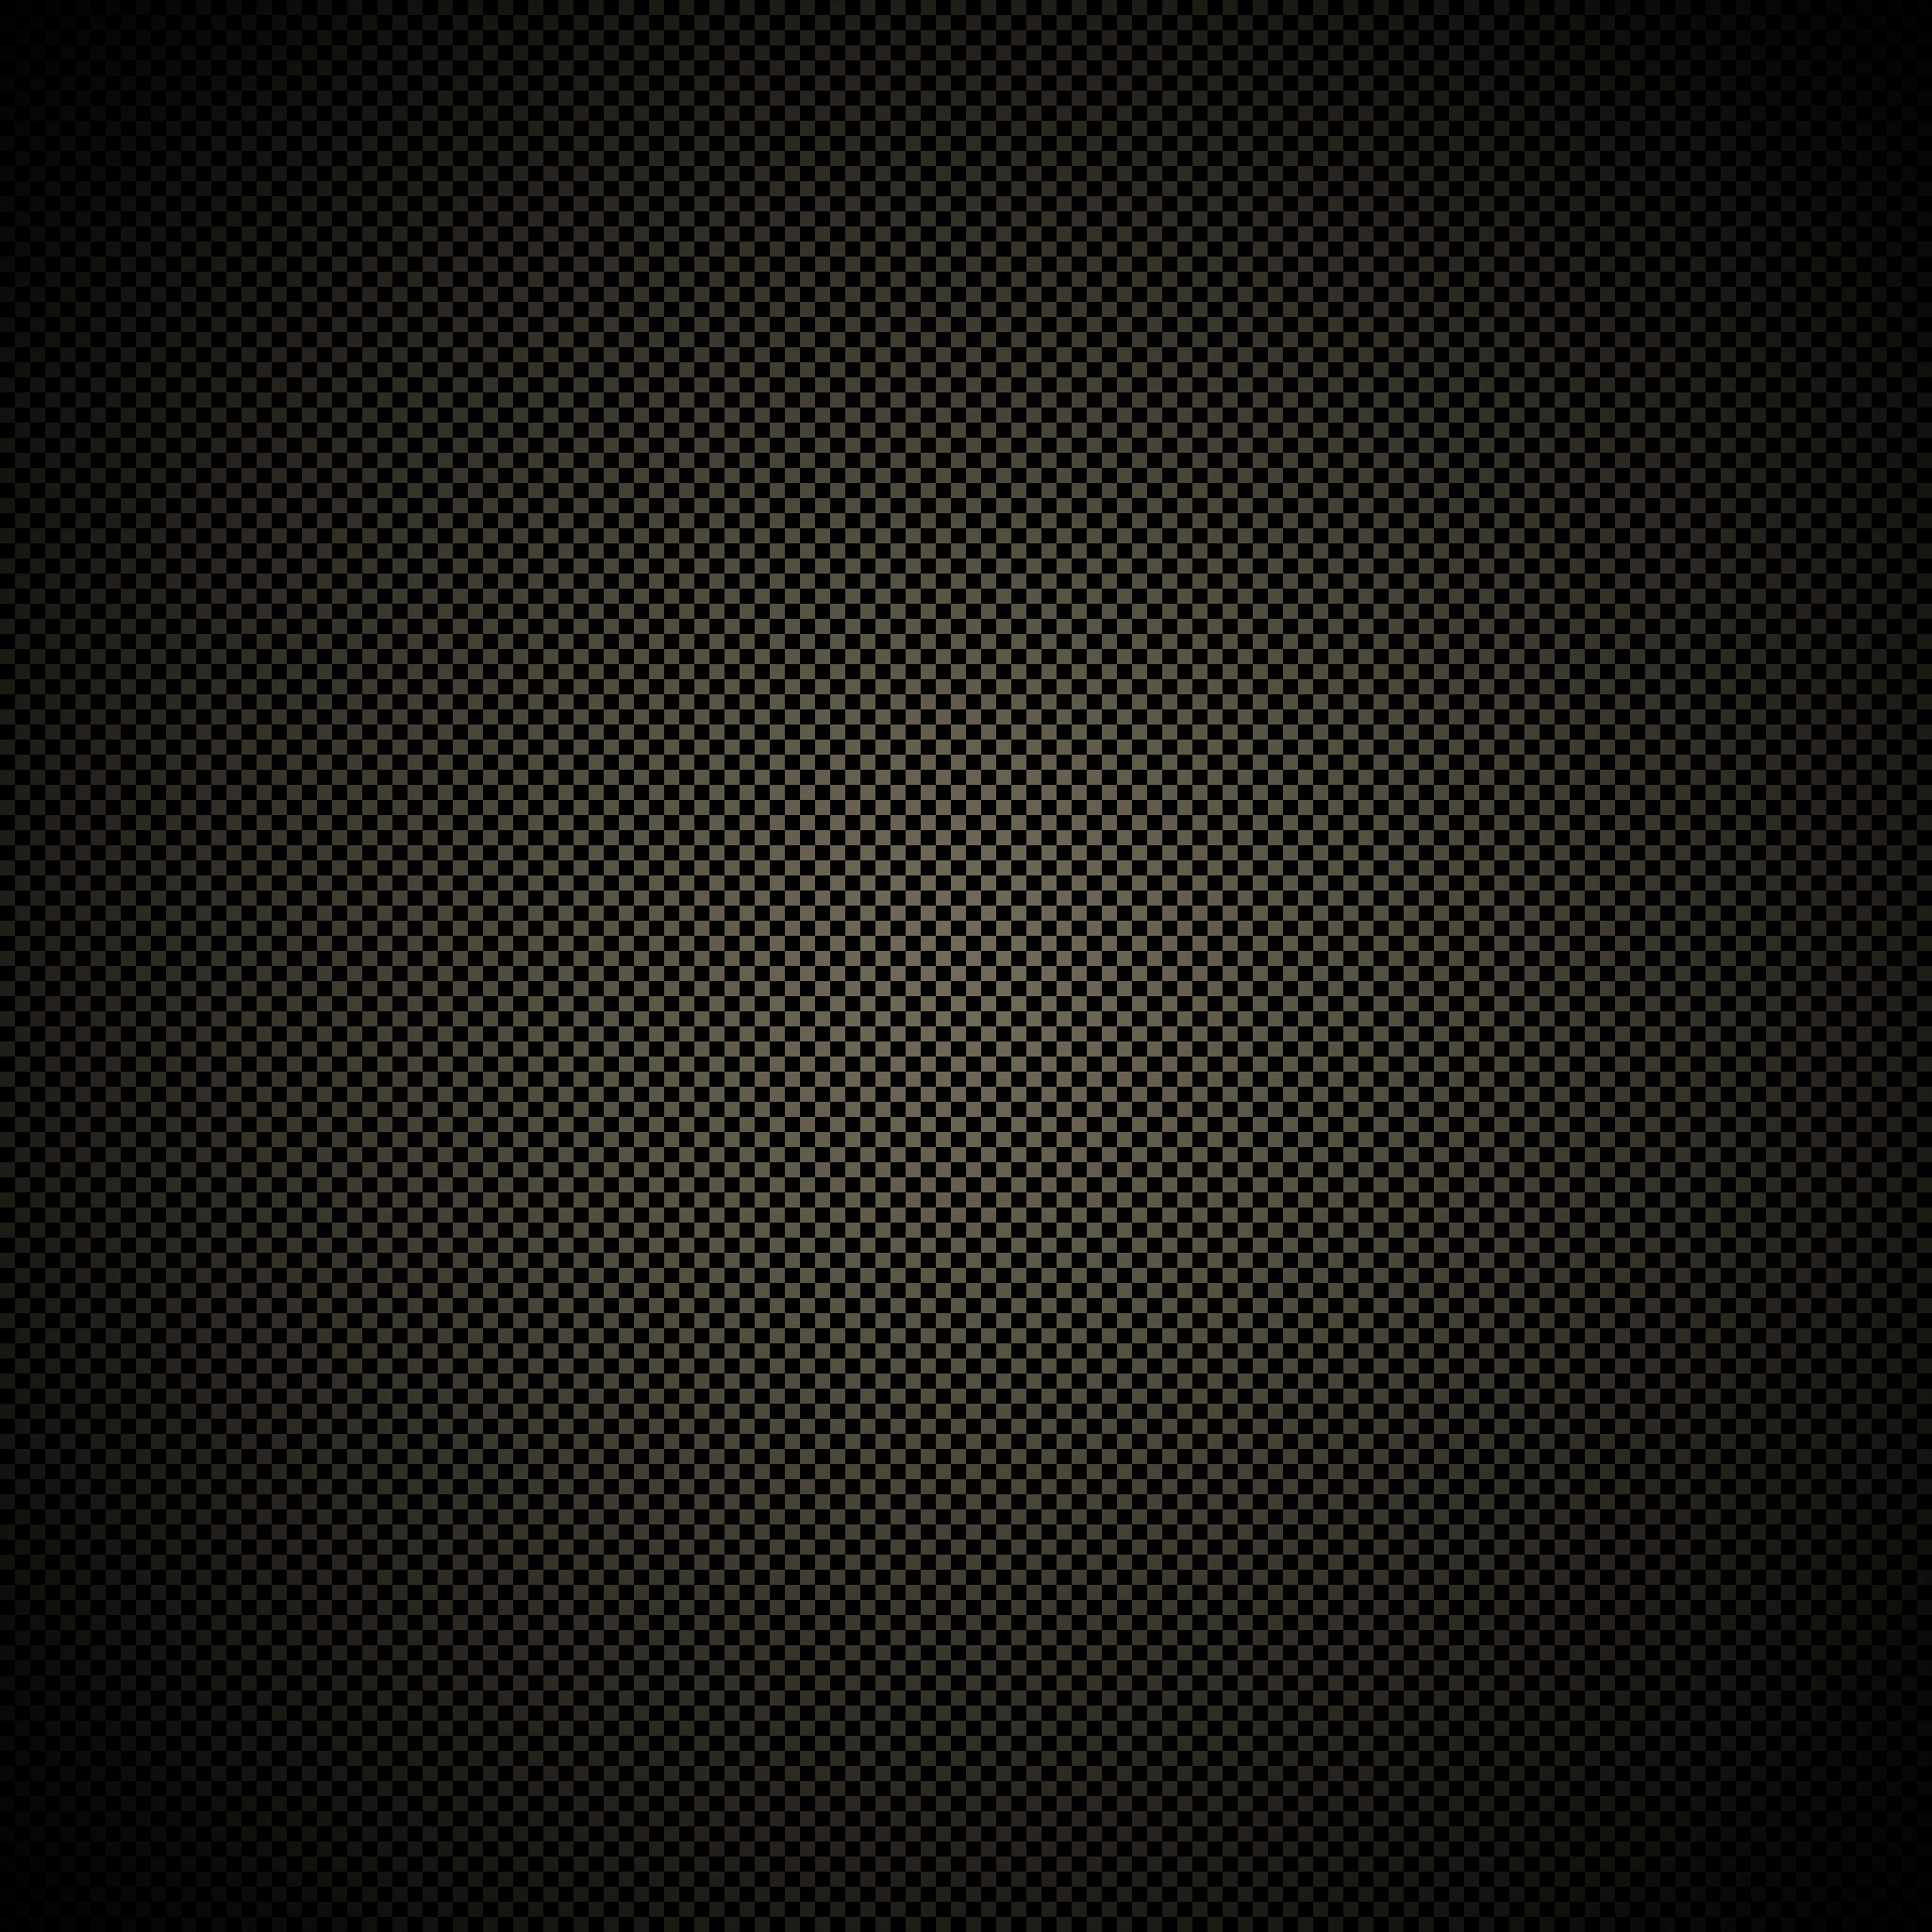 original ipad backgrounds 2048x2048